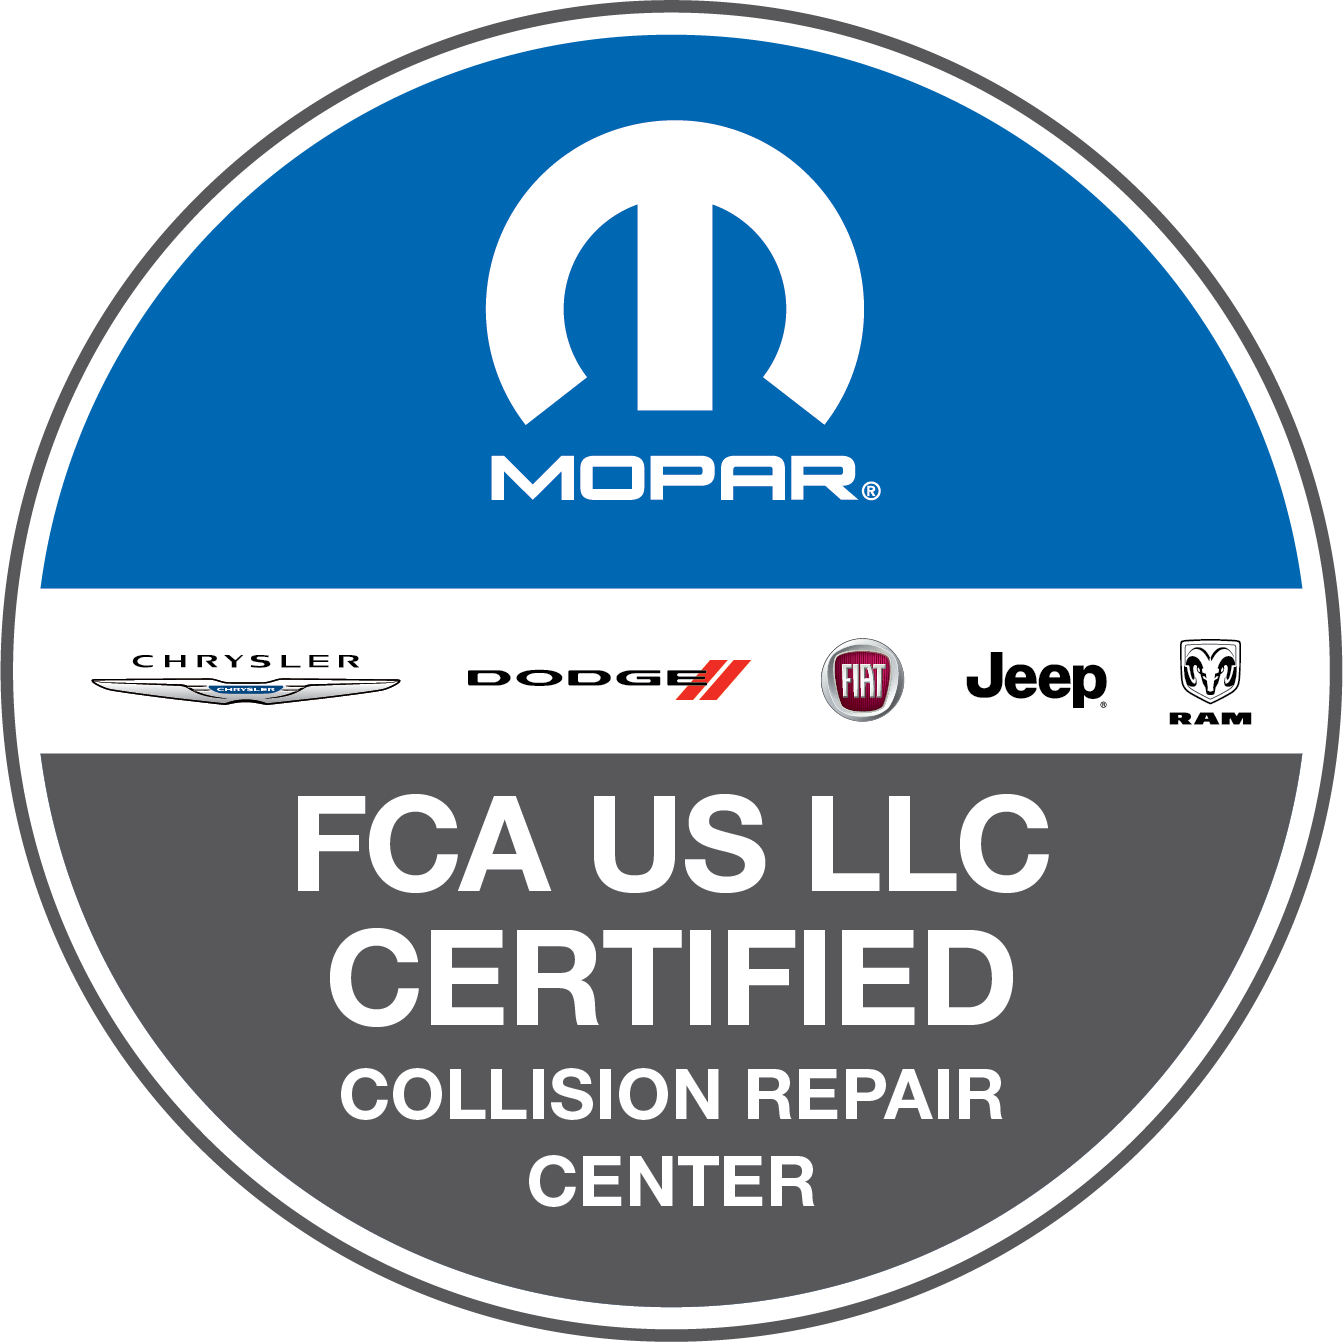 17_FCA_Cert_Collision_4C.png